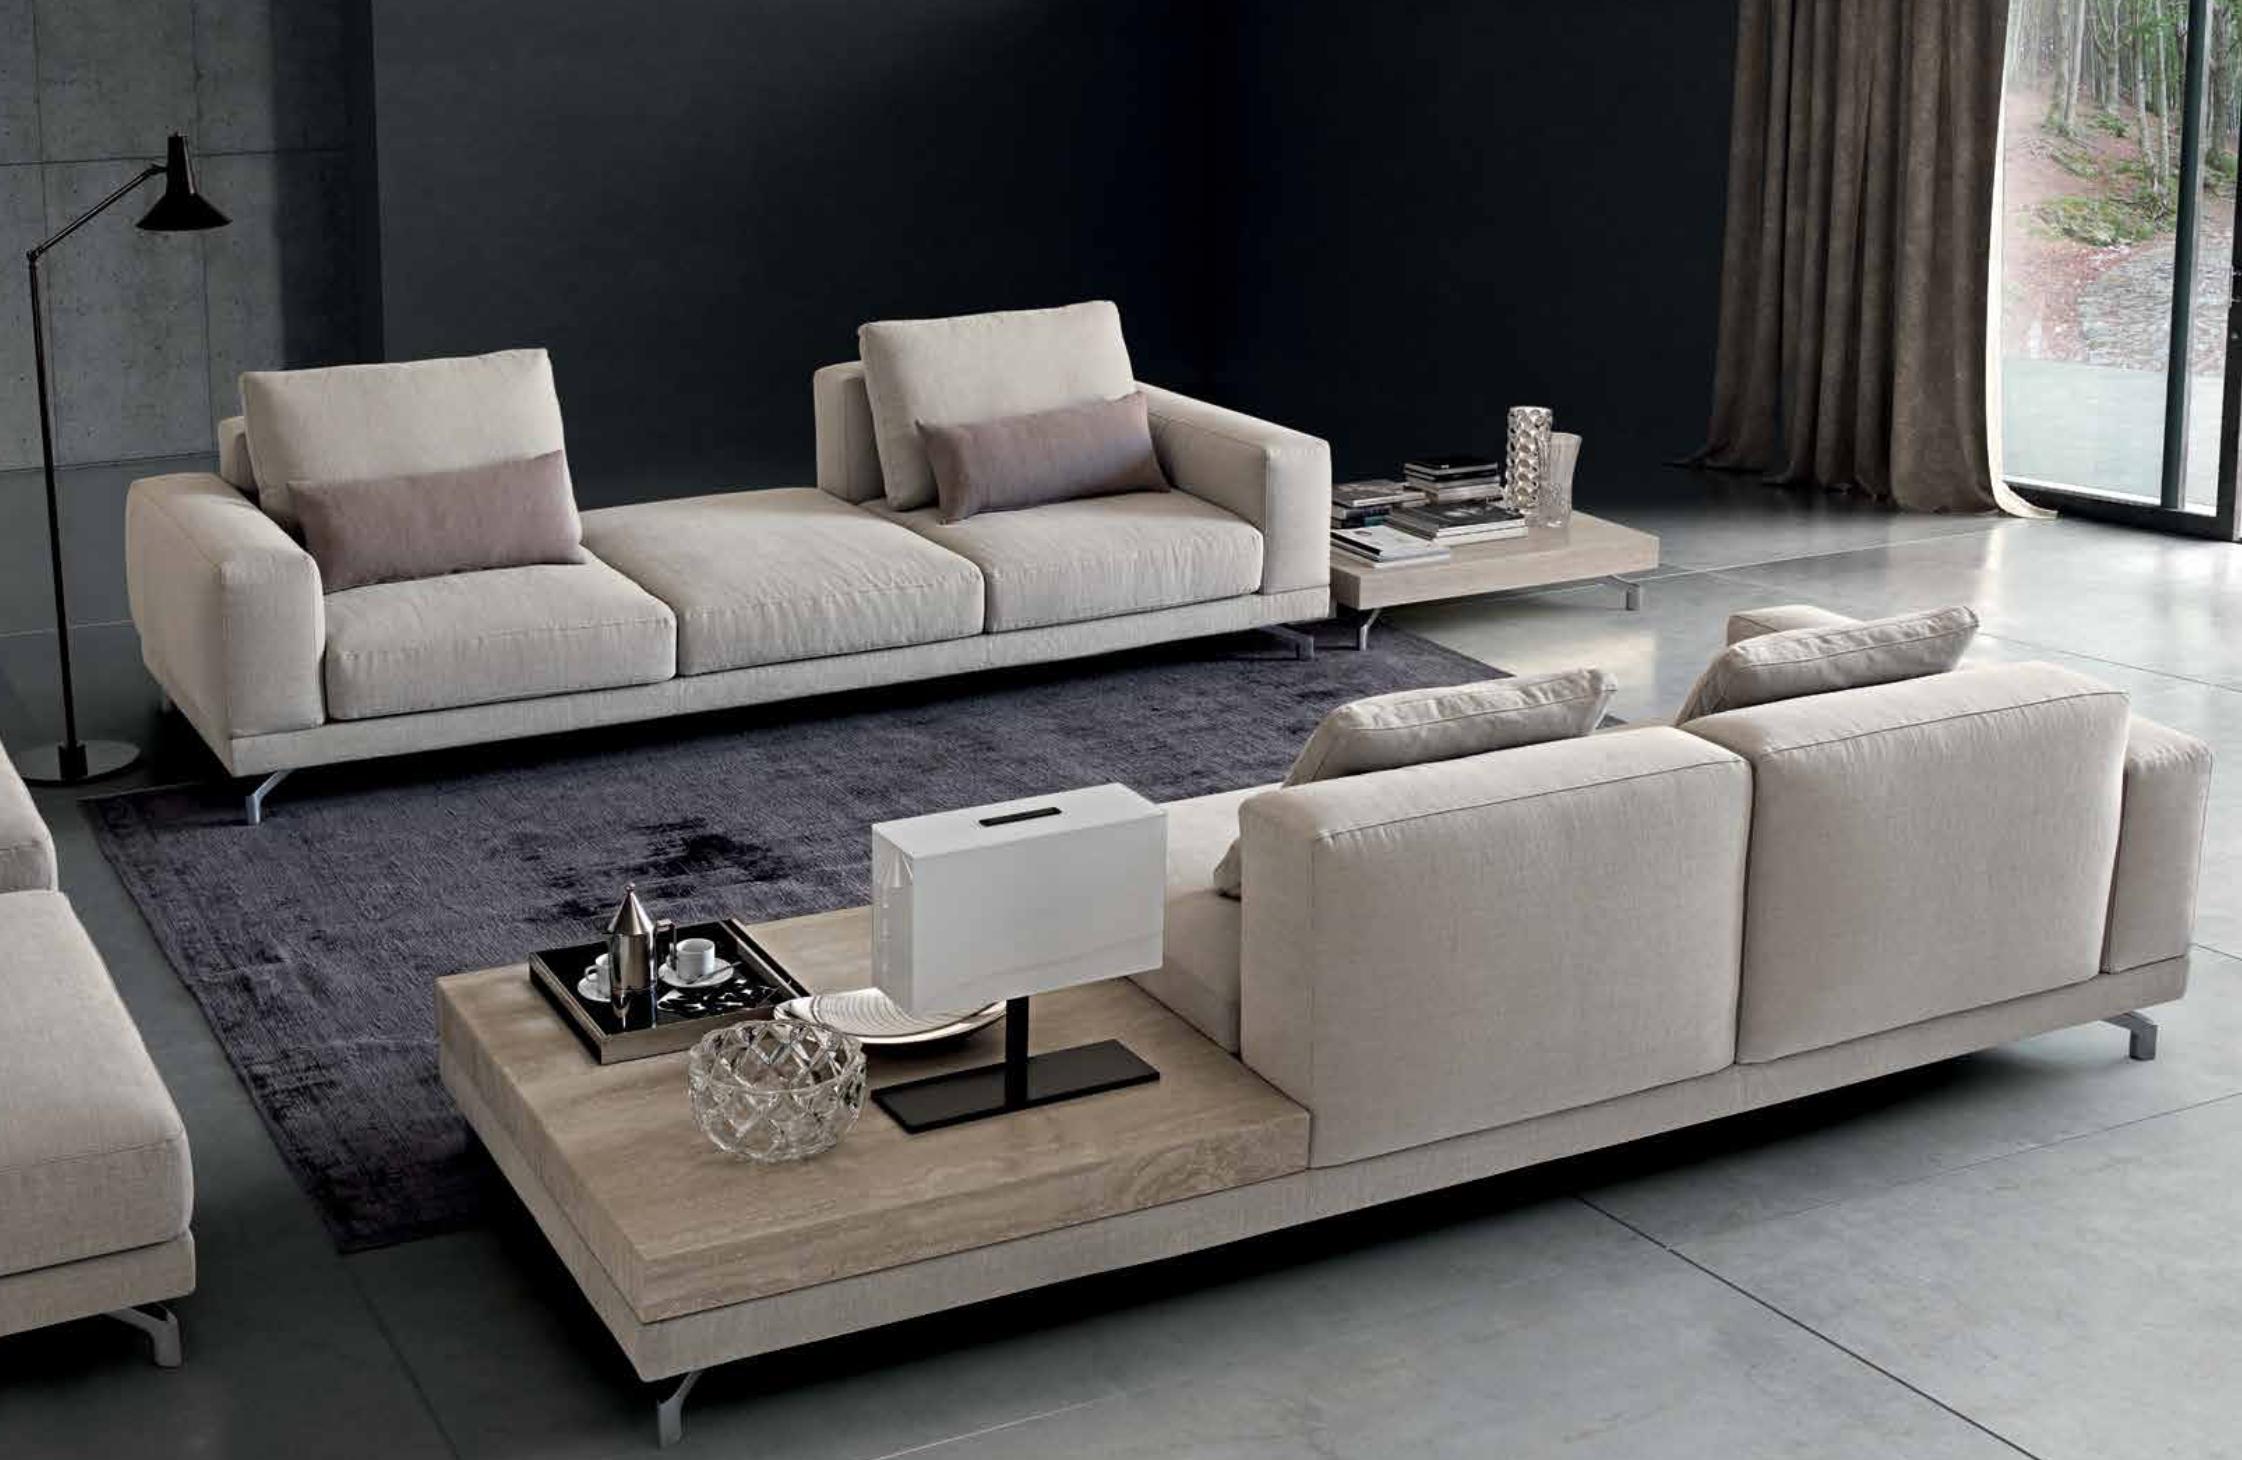 Interiors Advent Calendar - Dema Firenze Dude sofa living area | Masha Shapiro Agency.png